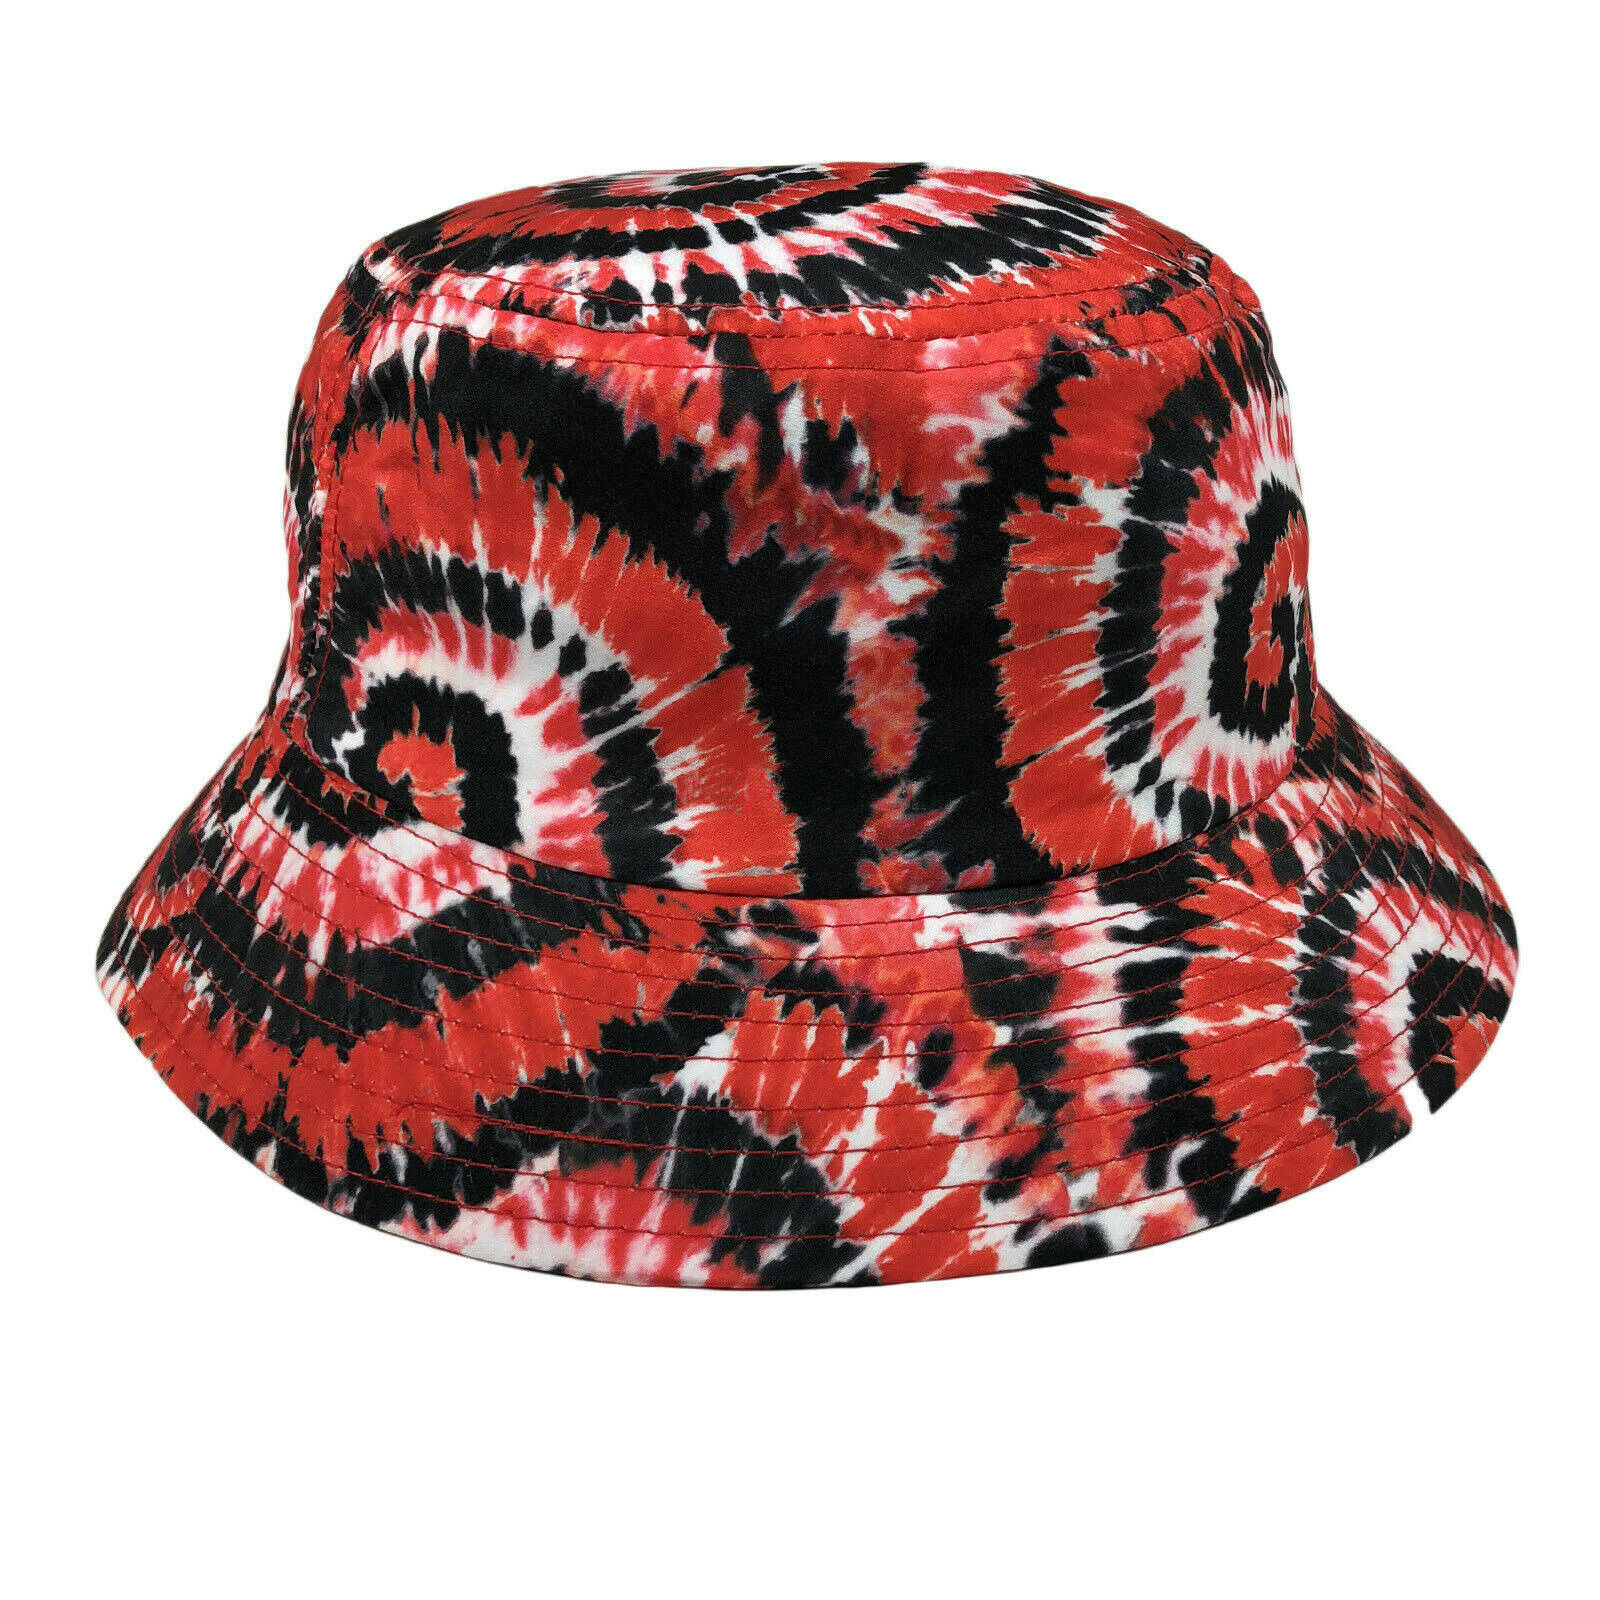 KB Ethos Bucket Fashion Print Hat Cap Unisex New Summer Easy ONE SIZE FIT